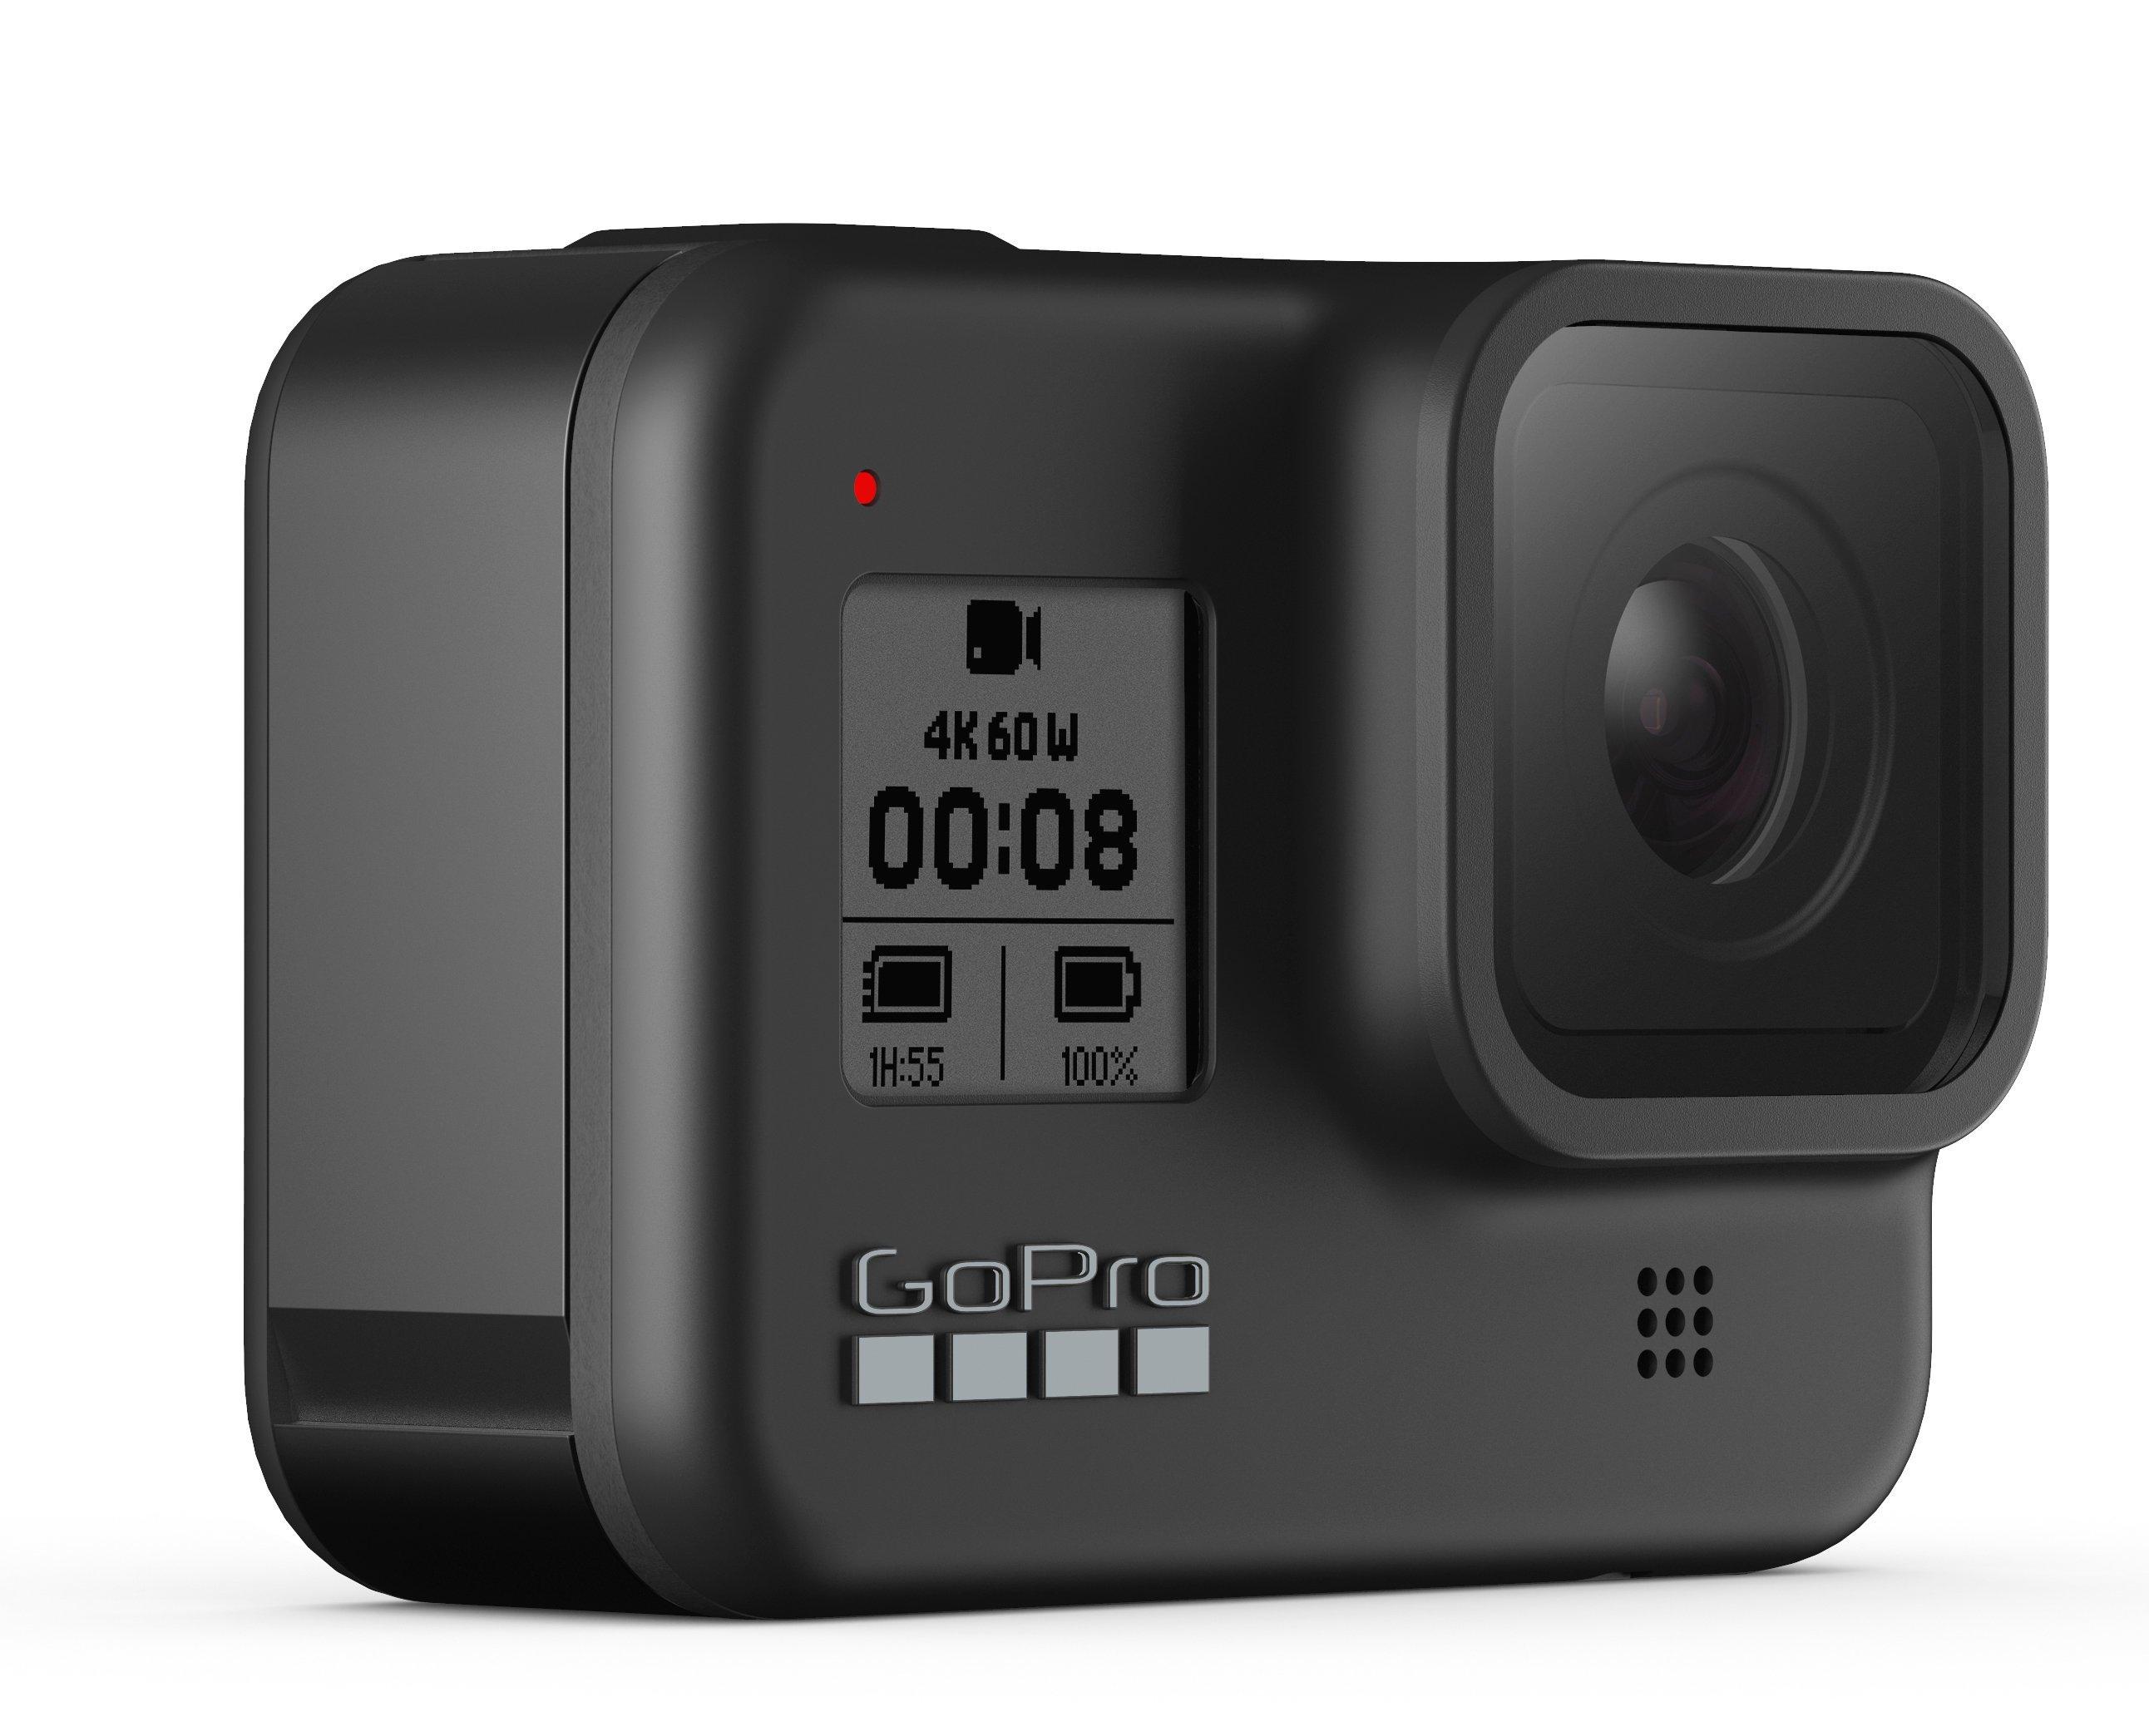 Kamera GoPro Hero 8 Black + GRATIS Battery Pack (bateria, ładowarka)